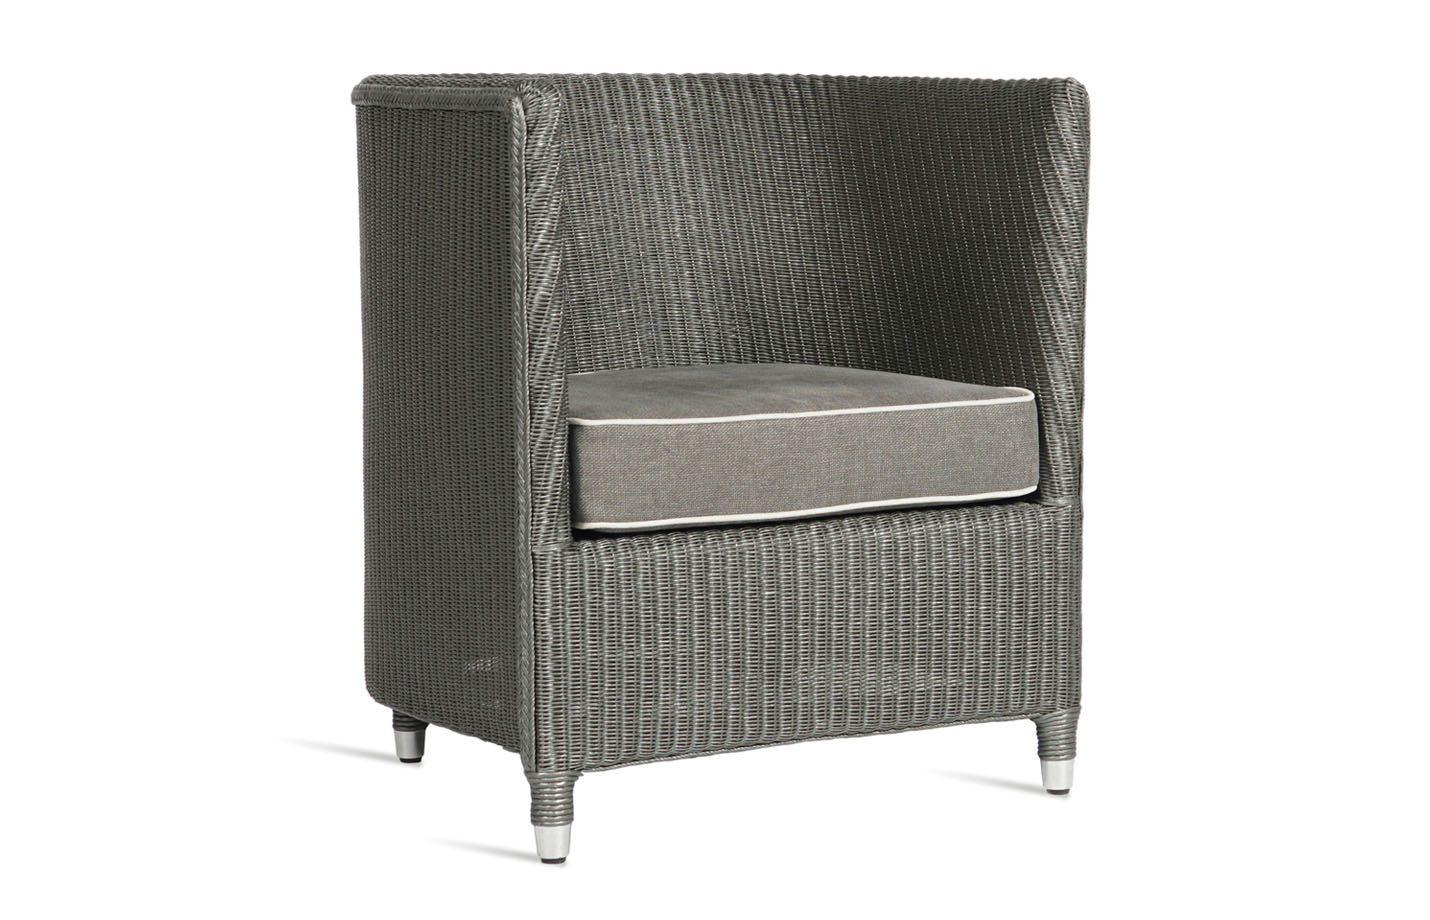 Tokyo-lounge-chair-01